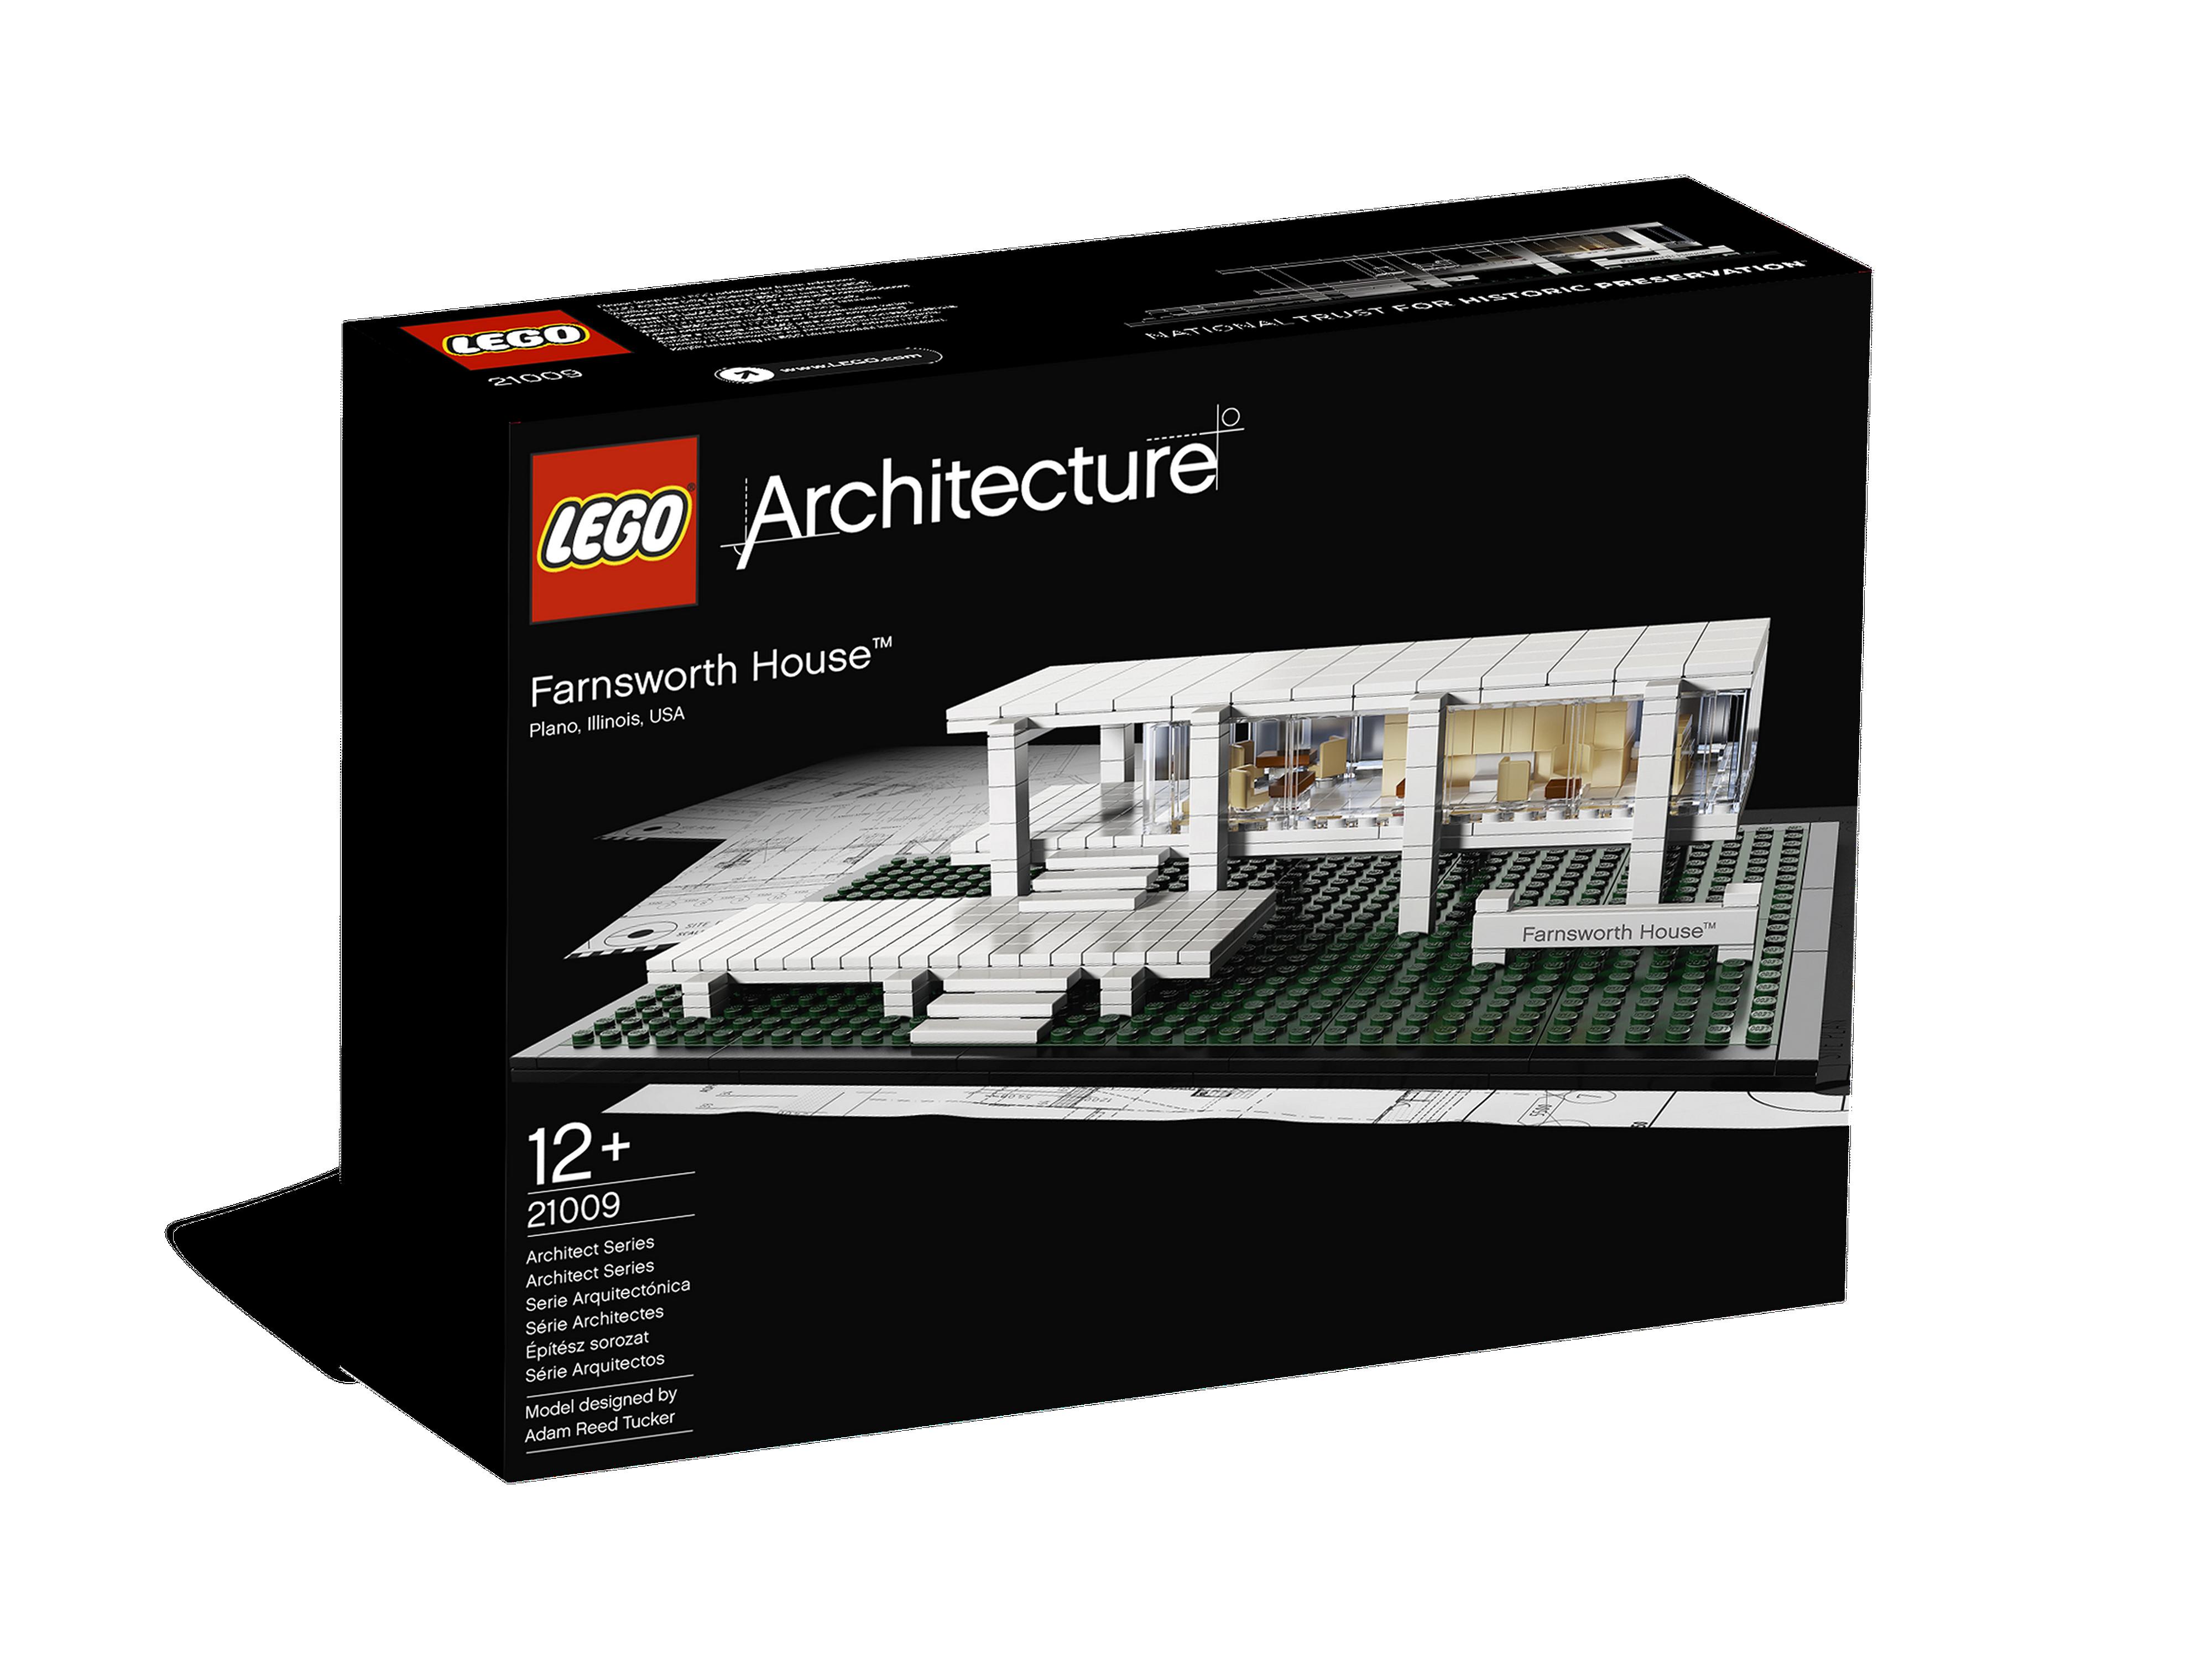 Illinois USA LEGO Architecture FARNSWORTH HOUSE 21009 Plano